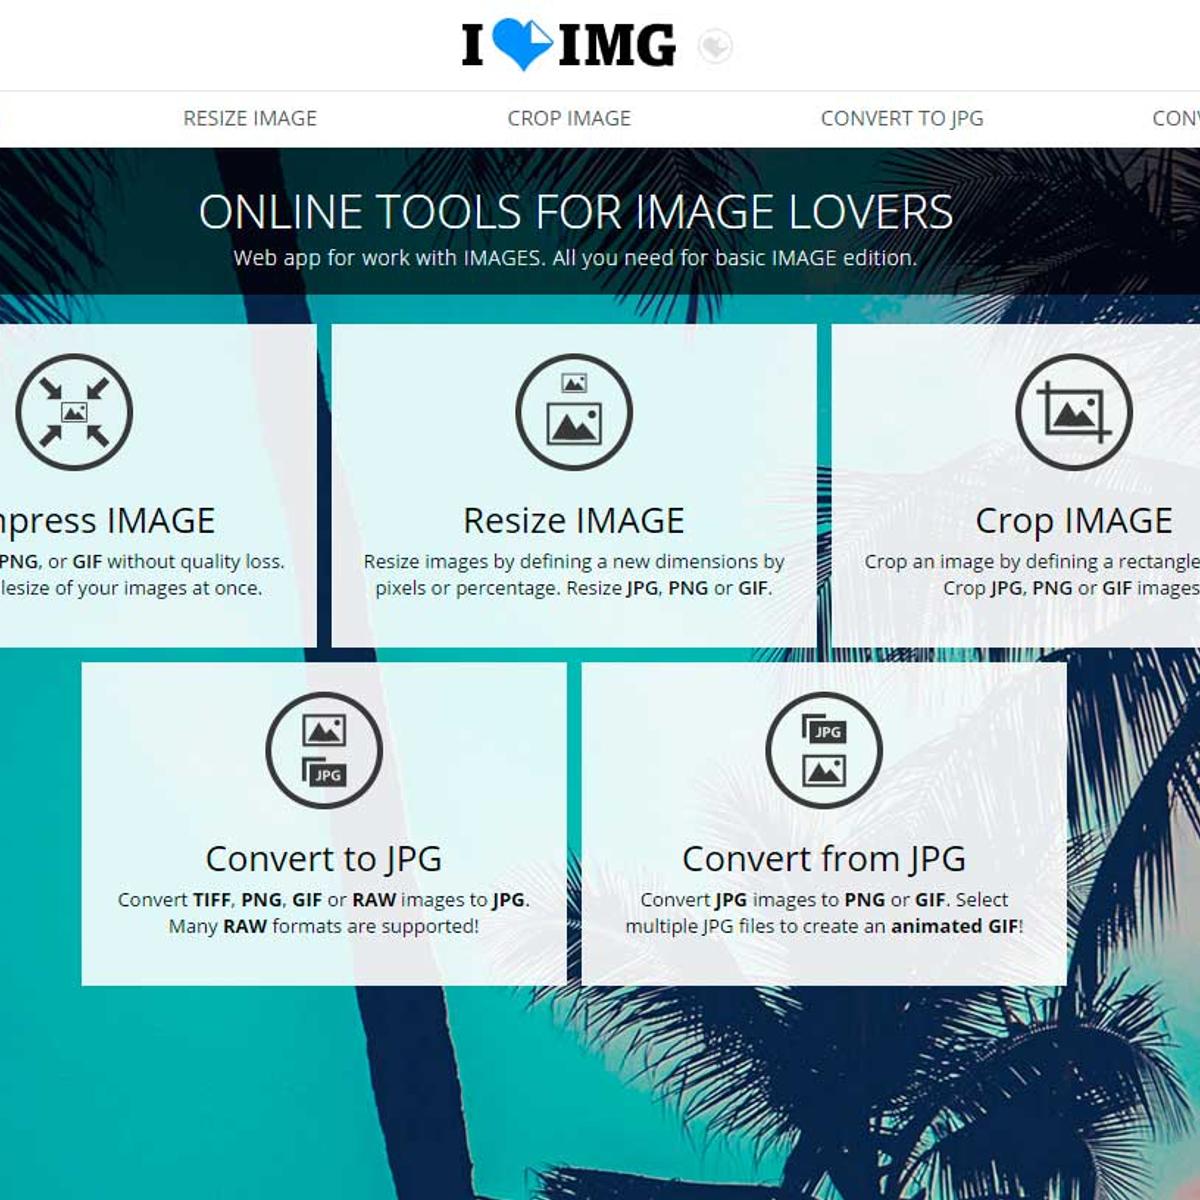 convert jpg to raw online